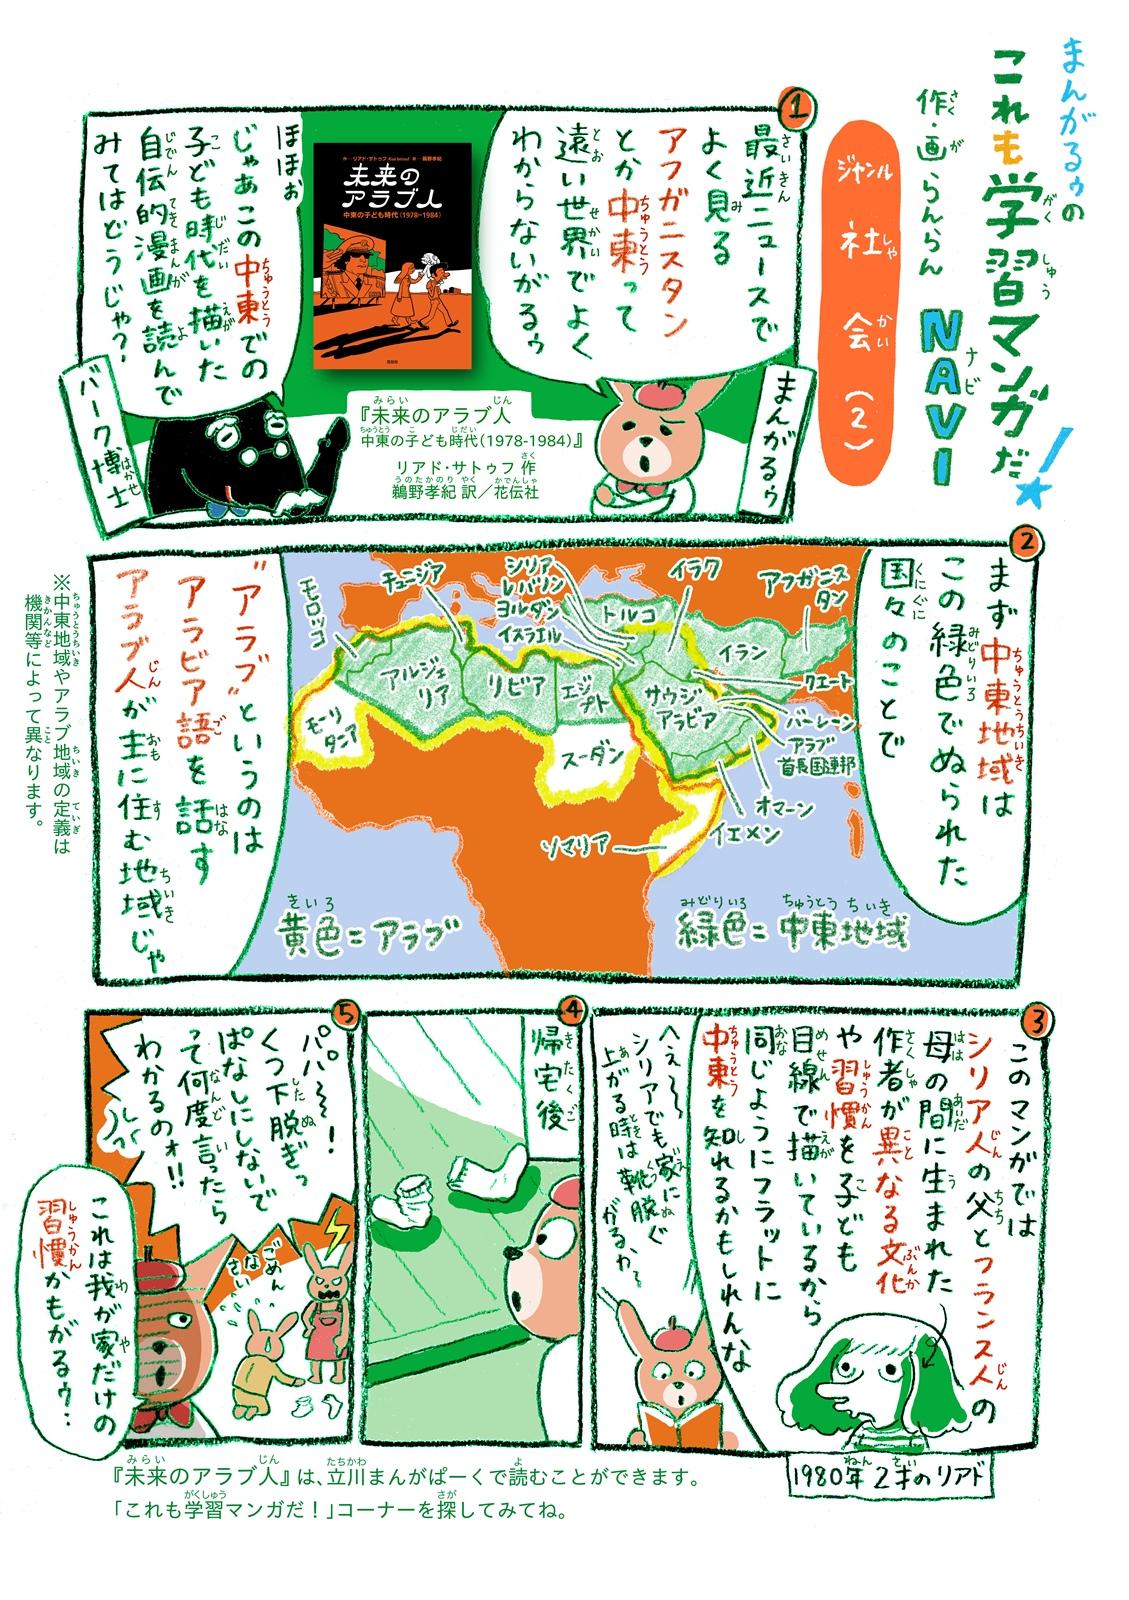 https://mangapark.jp/topics/2021/09/30/images/mangaroo_vol24_resize.jpg